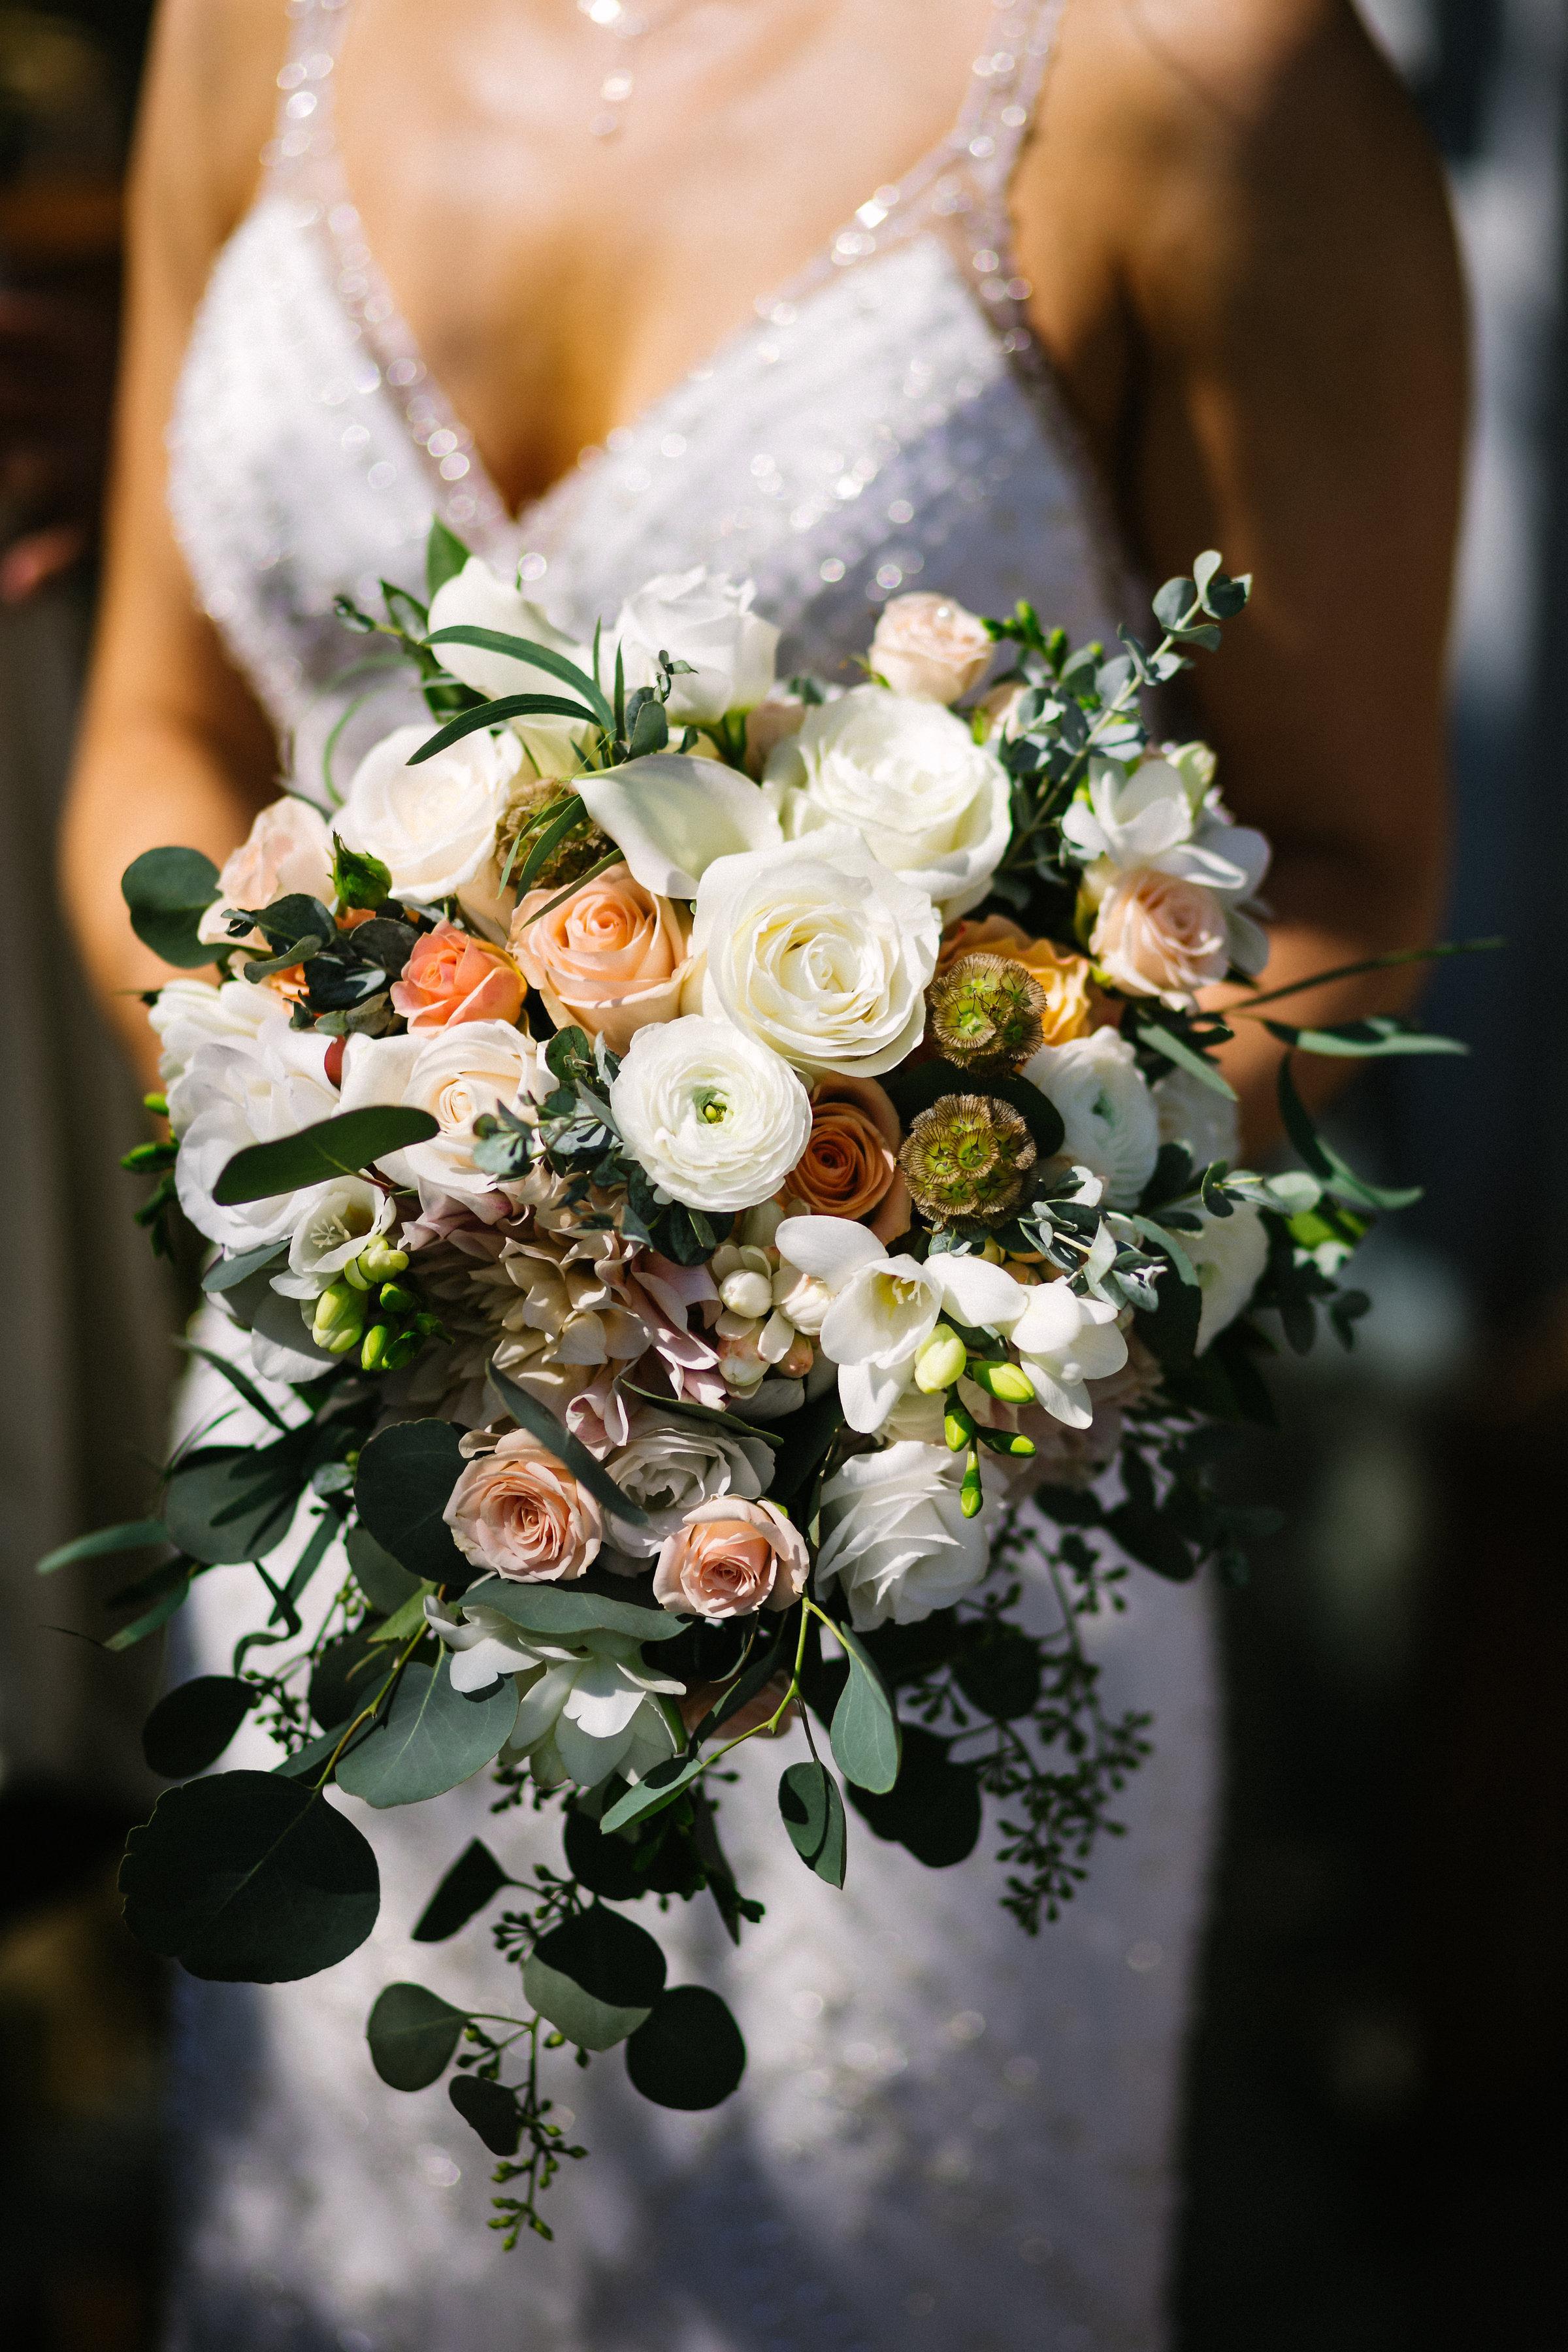 MELISSA_MARCO_WEDDING_065.jpg